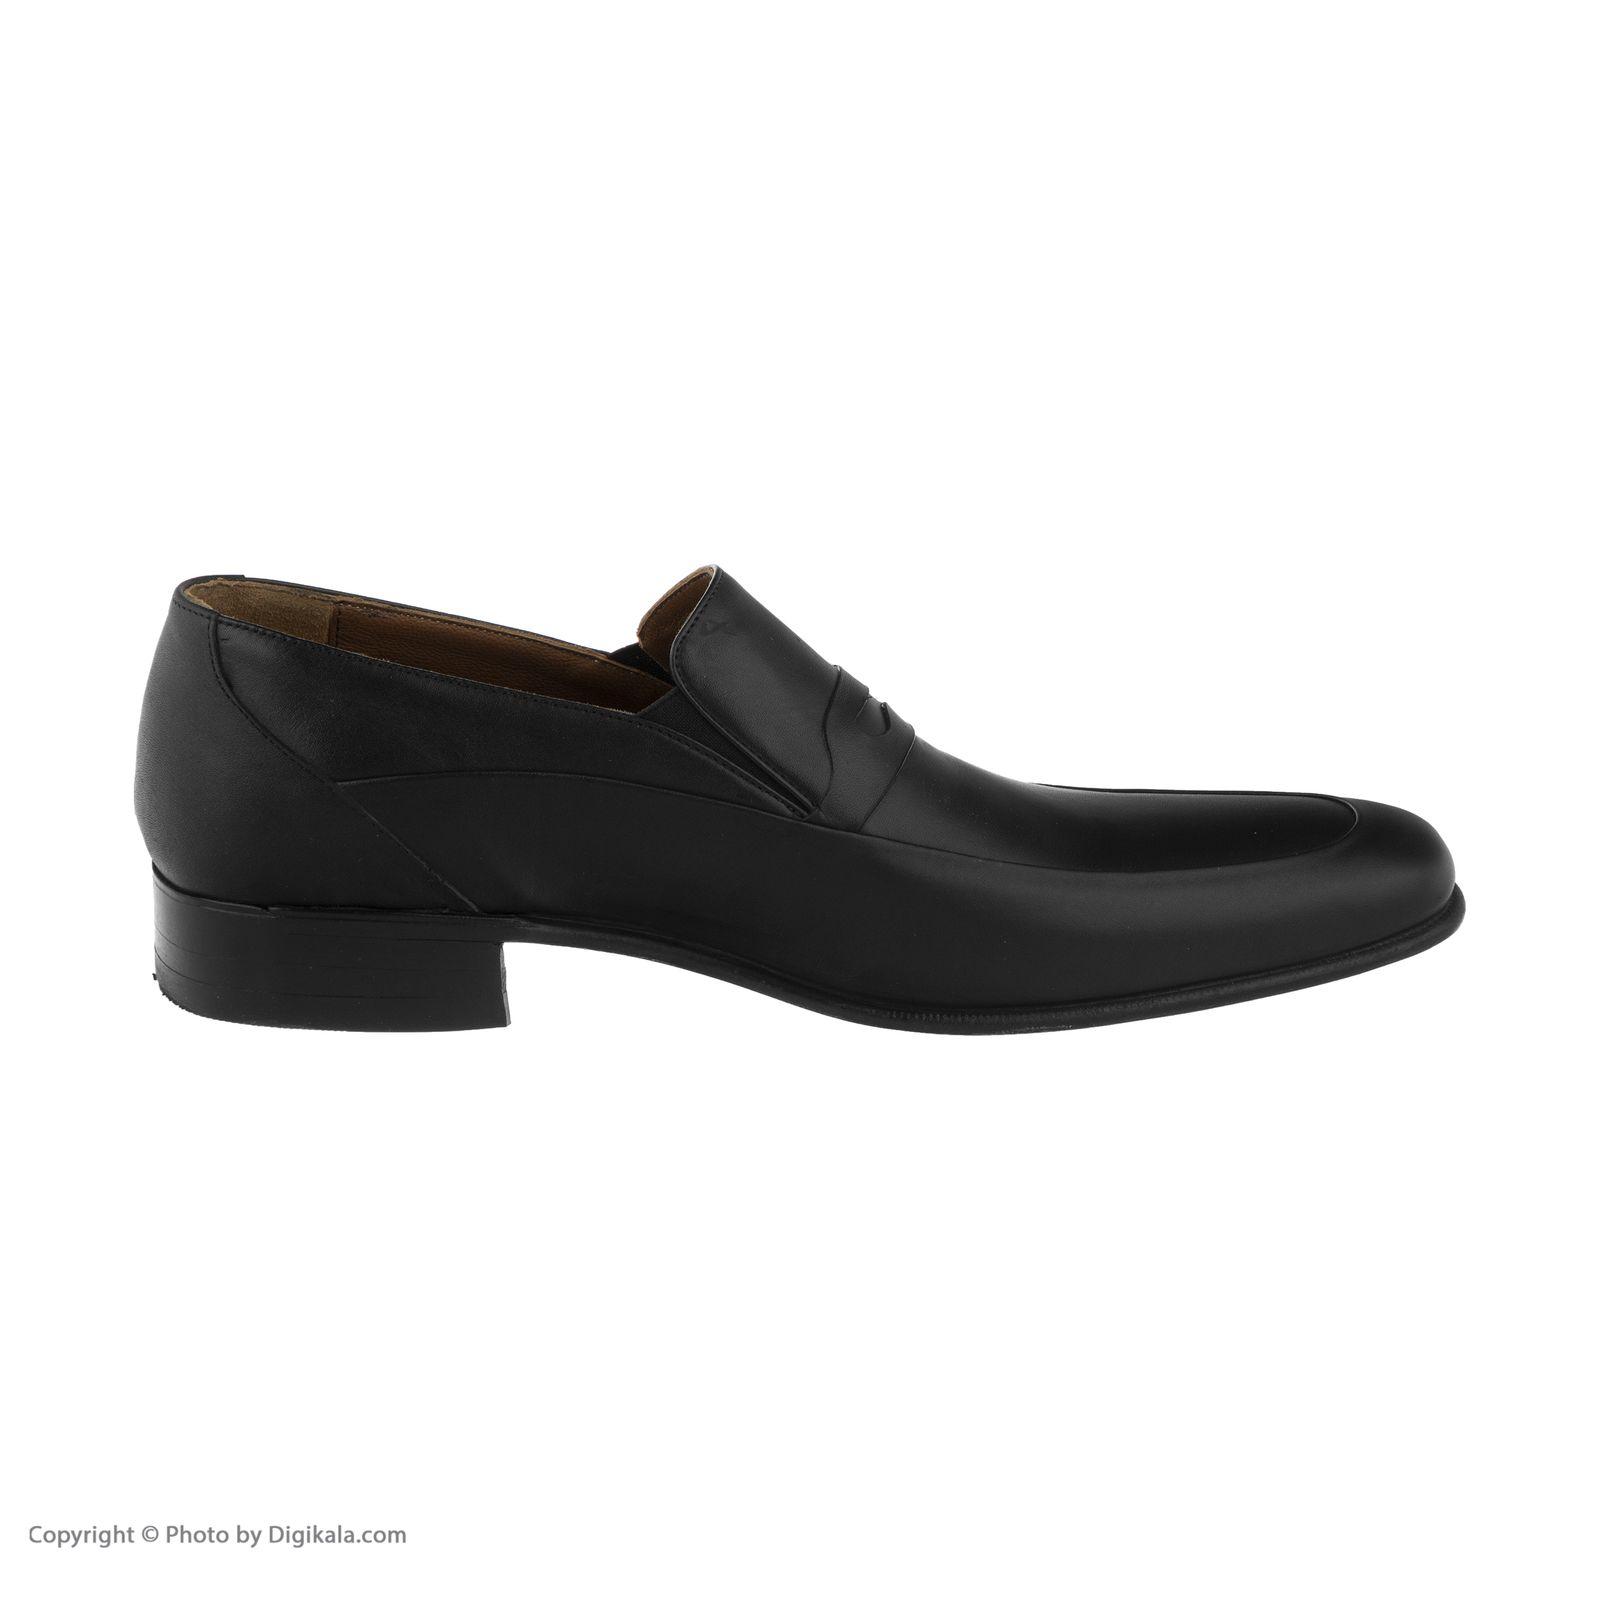 کفش مردانه نظری کد 421 -  - 5